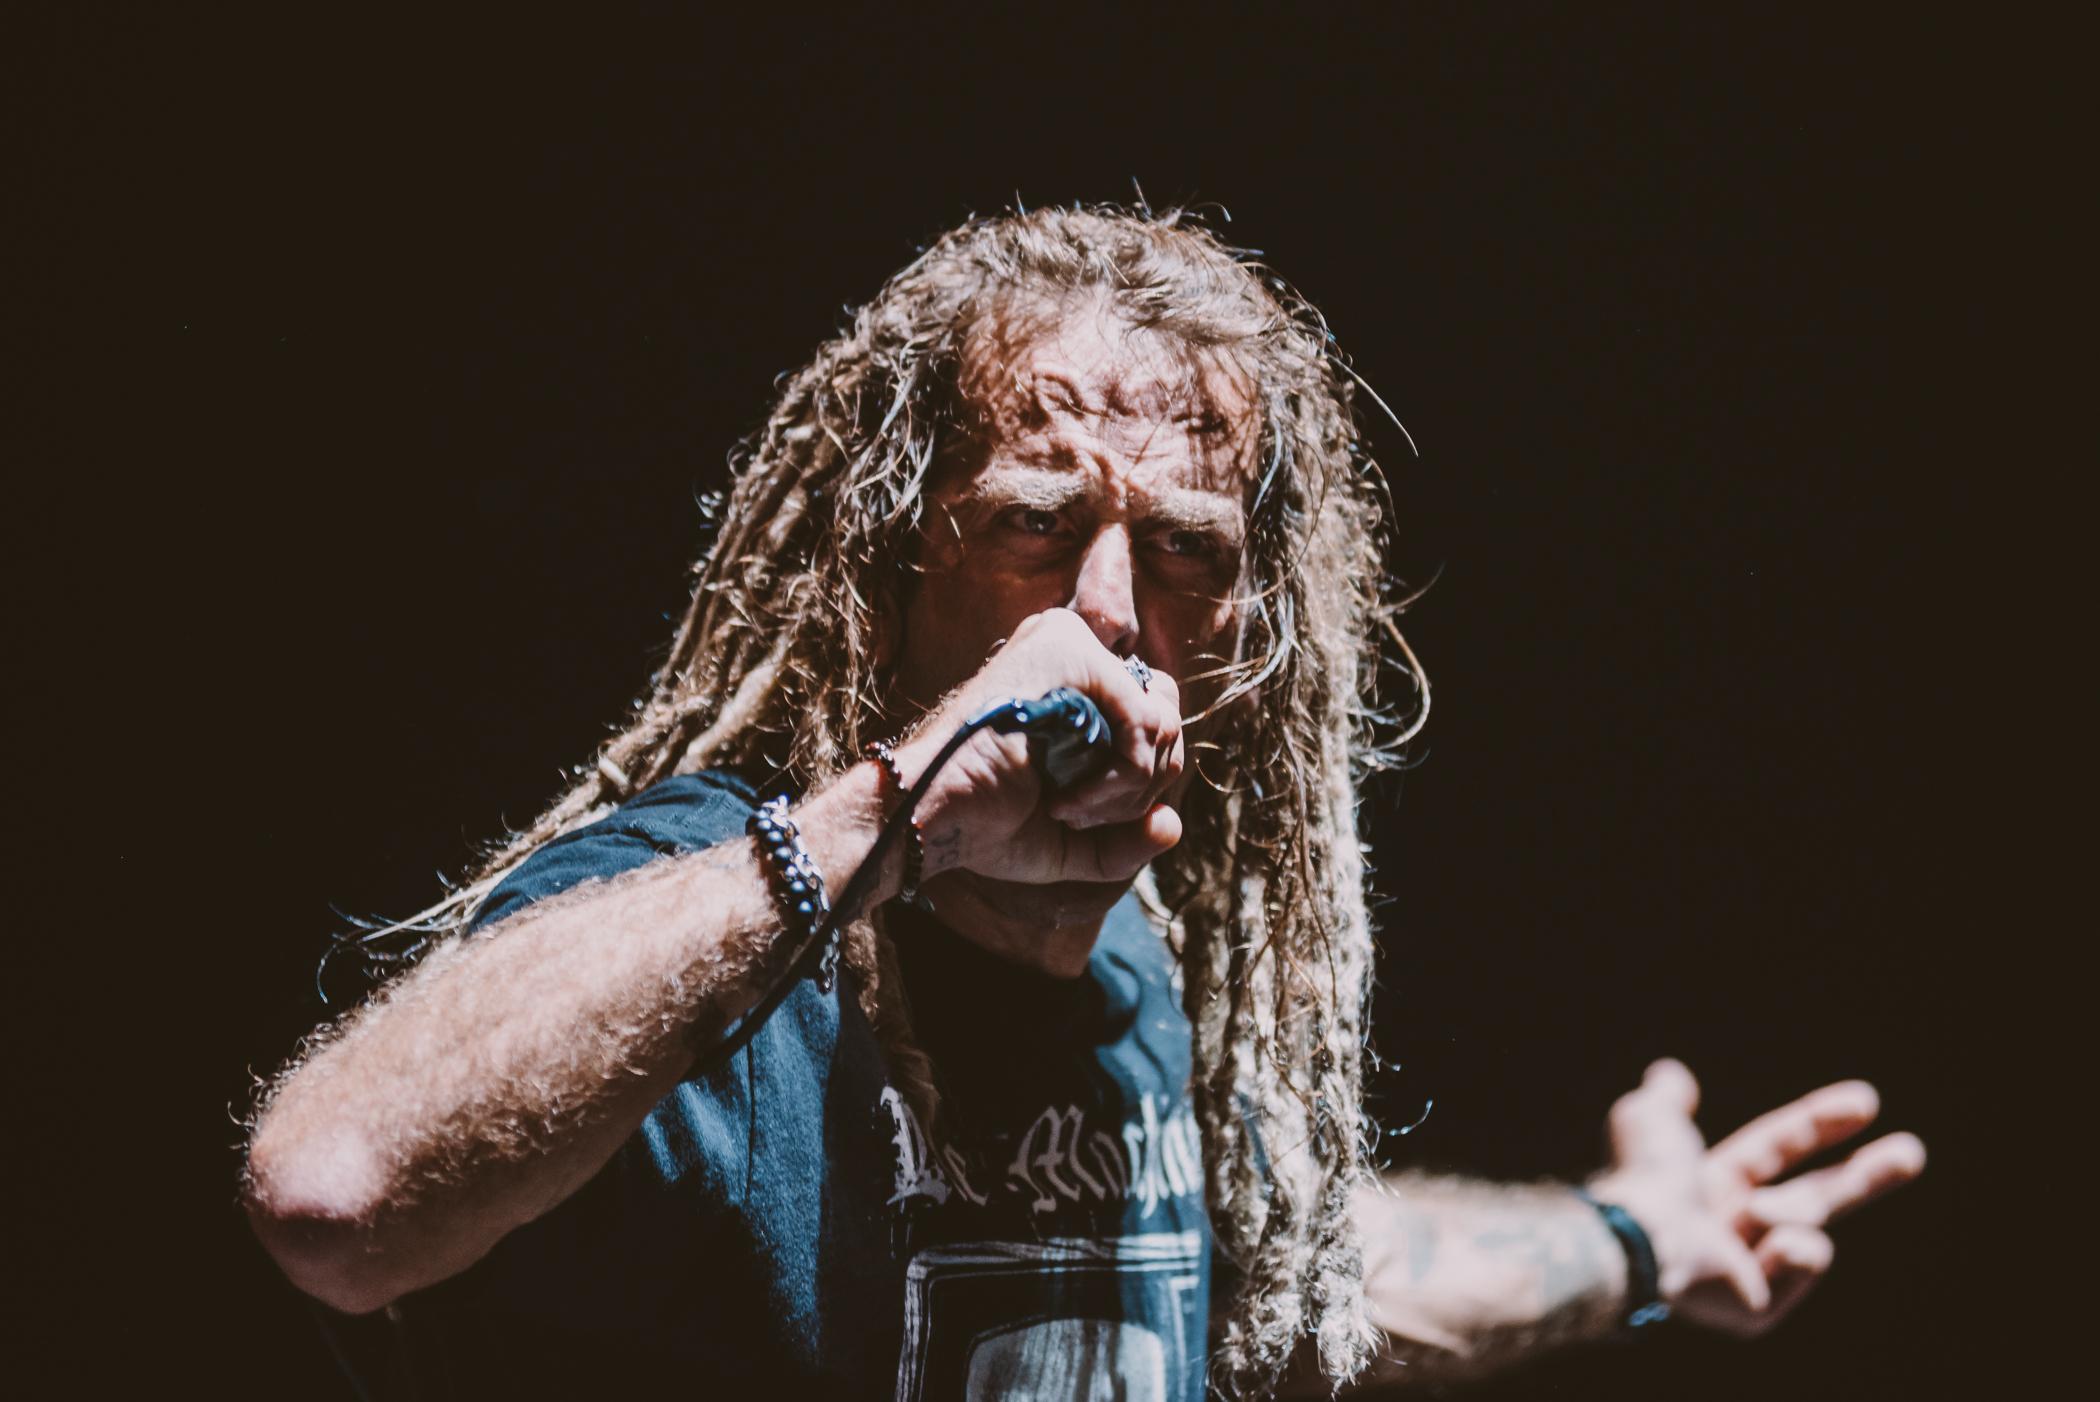 1_Lamb_Of_God-Pacific_Coliseum-Vancouver-Timothy_Nguyen-20180516 (35 of 47).jpg